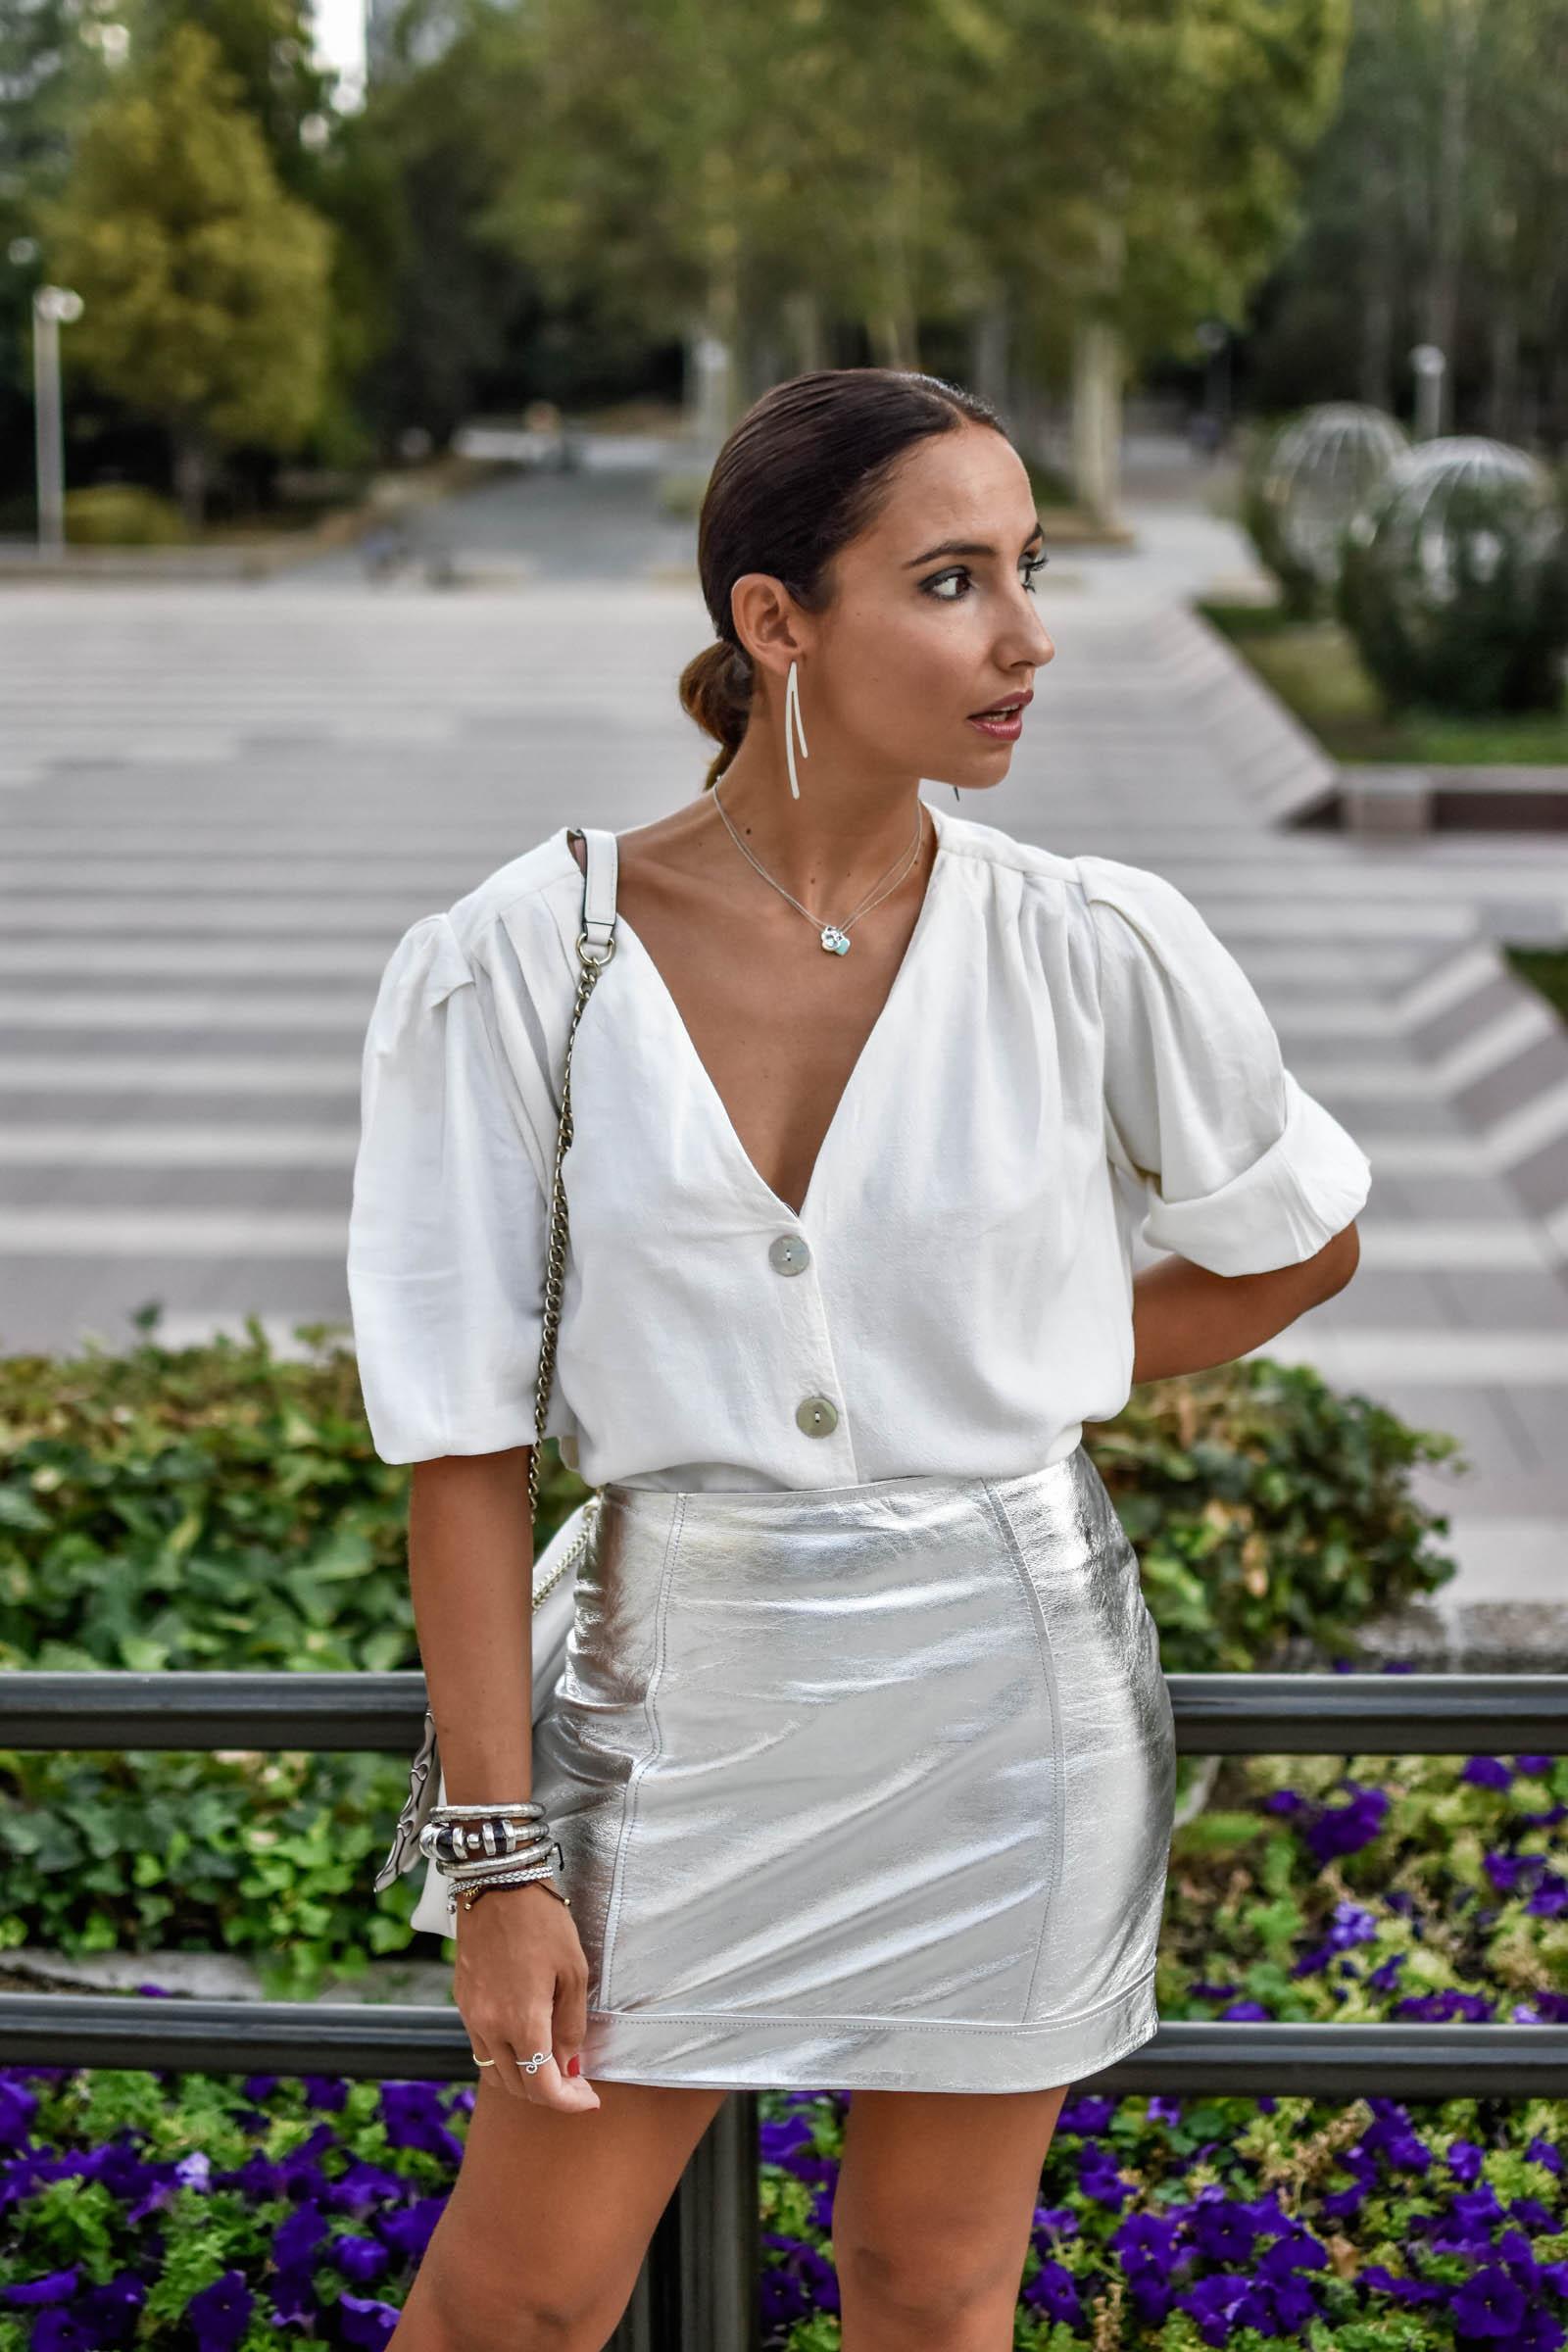 https://www.elblogdesilvia.com/wp-content/uploads/2018/10/el-blog-de-silvia-rodriguez-street-style-madrid-revolve-silver-skirt-h.jpg